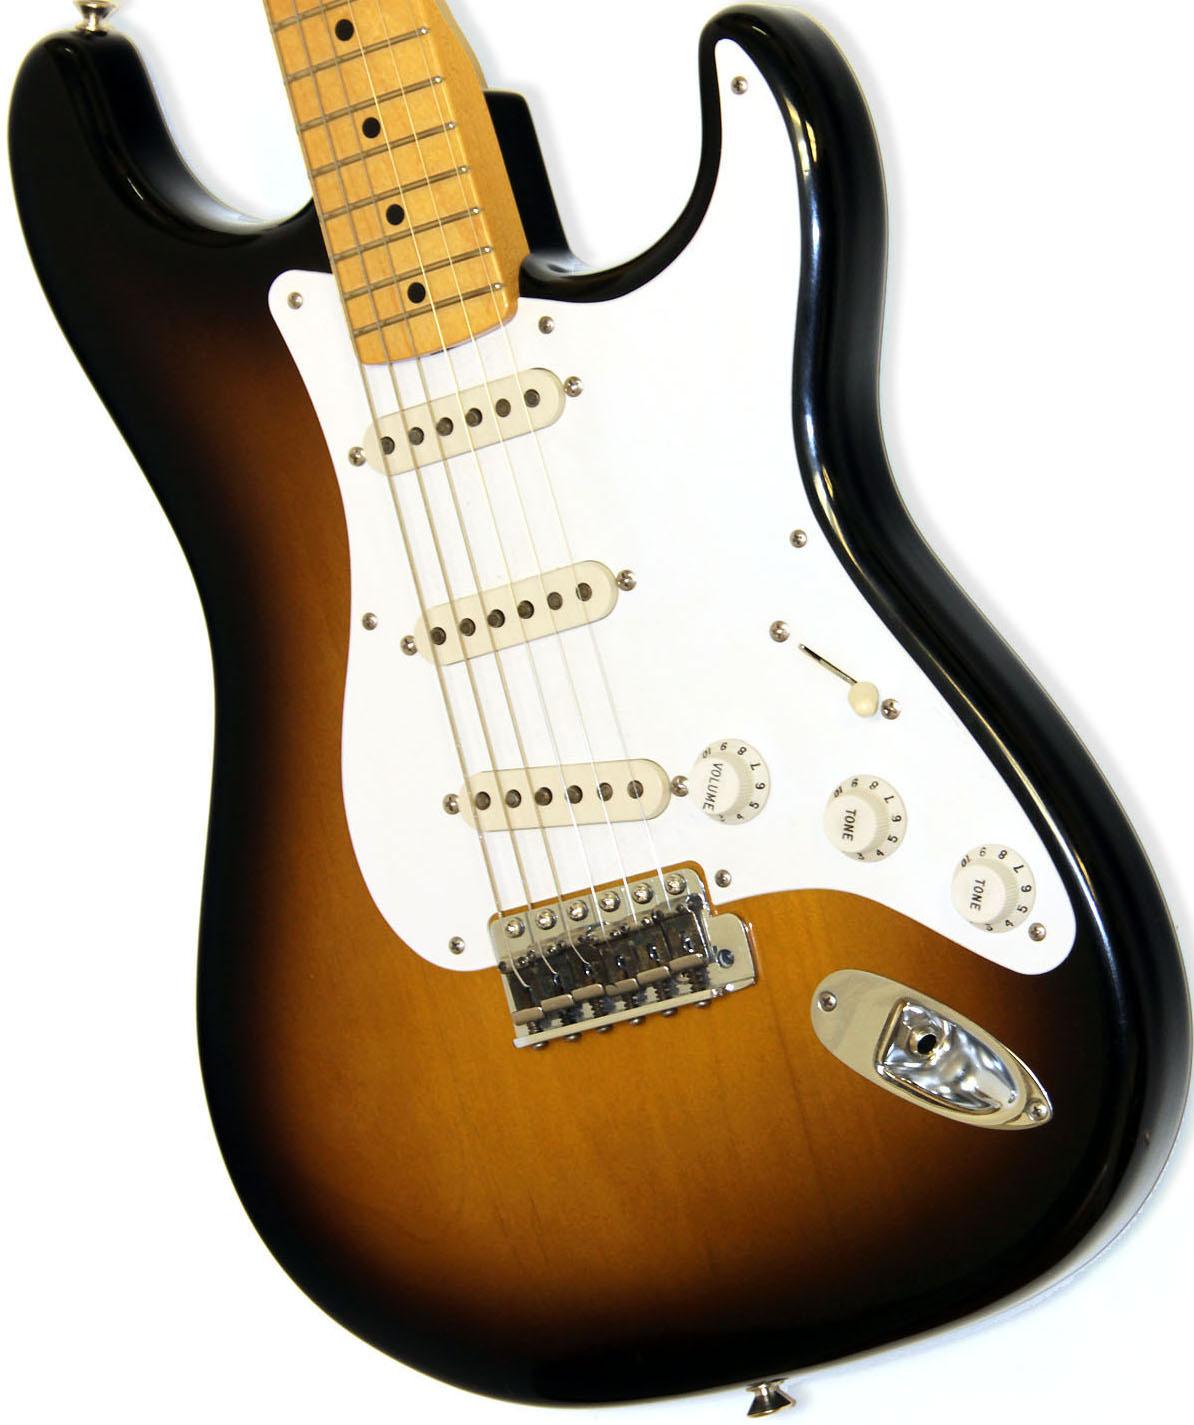 Stratocaster Pickguards - Original Vintage, Reissue